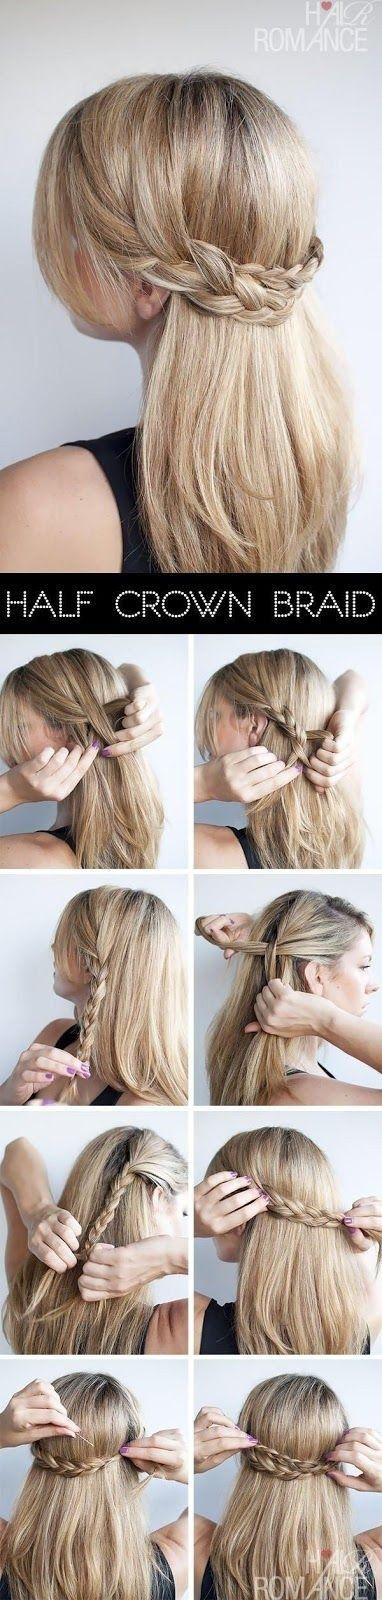 Learn easily half crown braid style